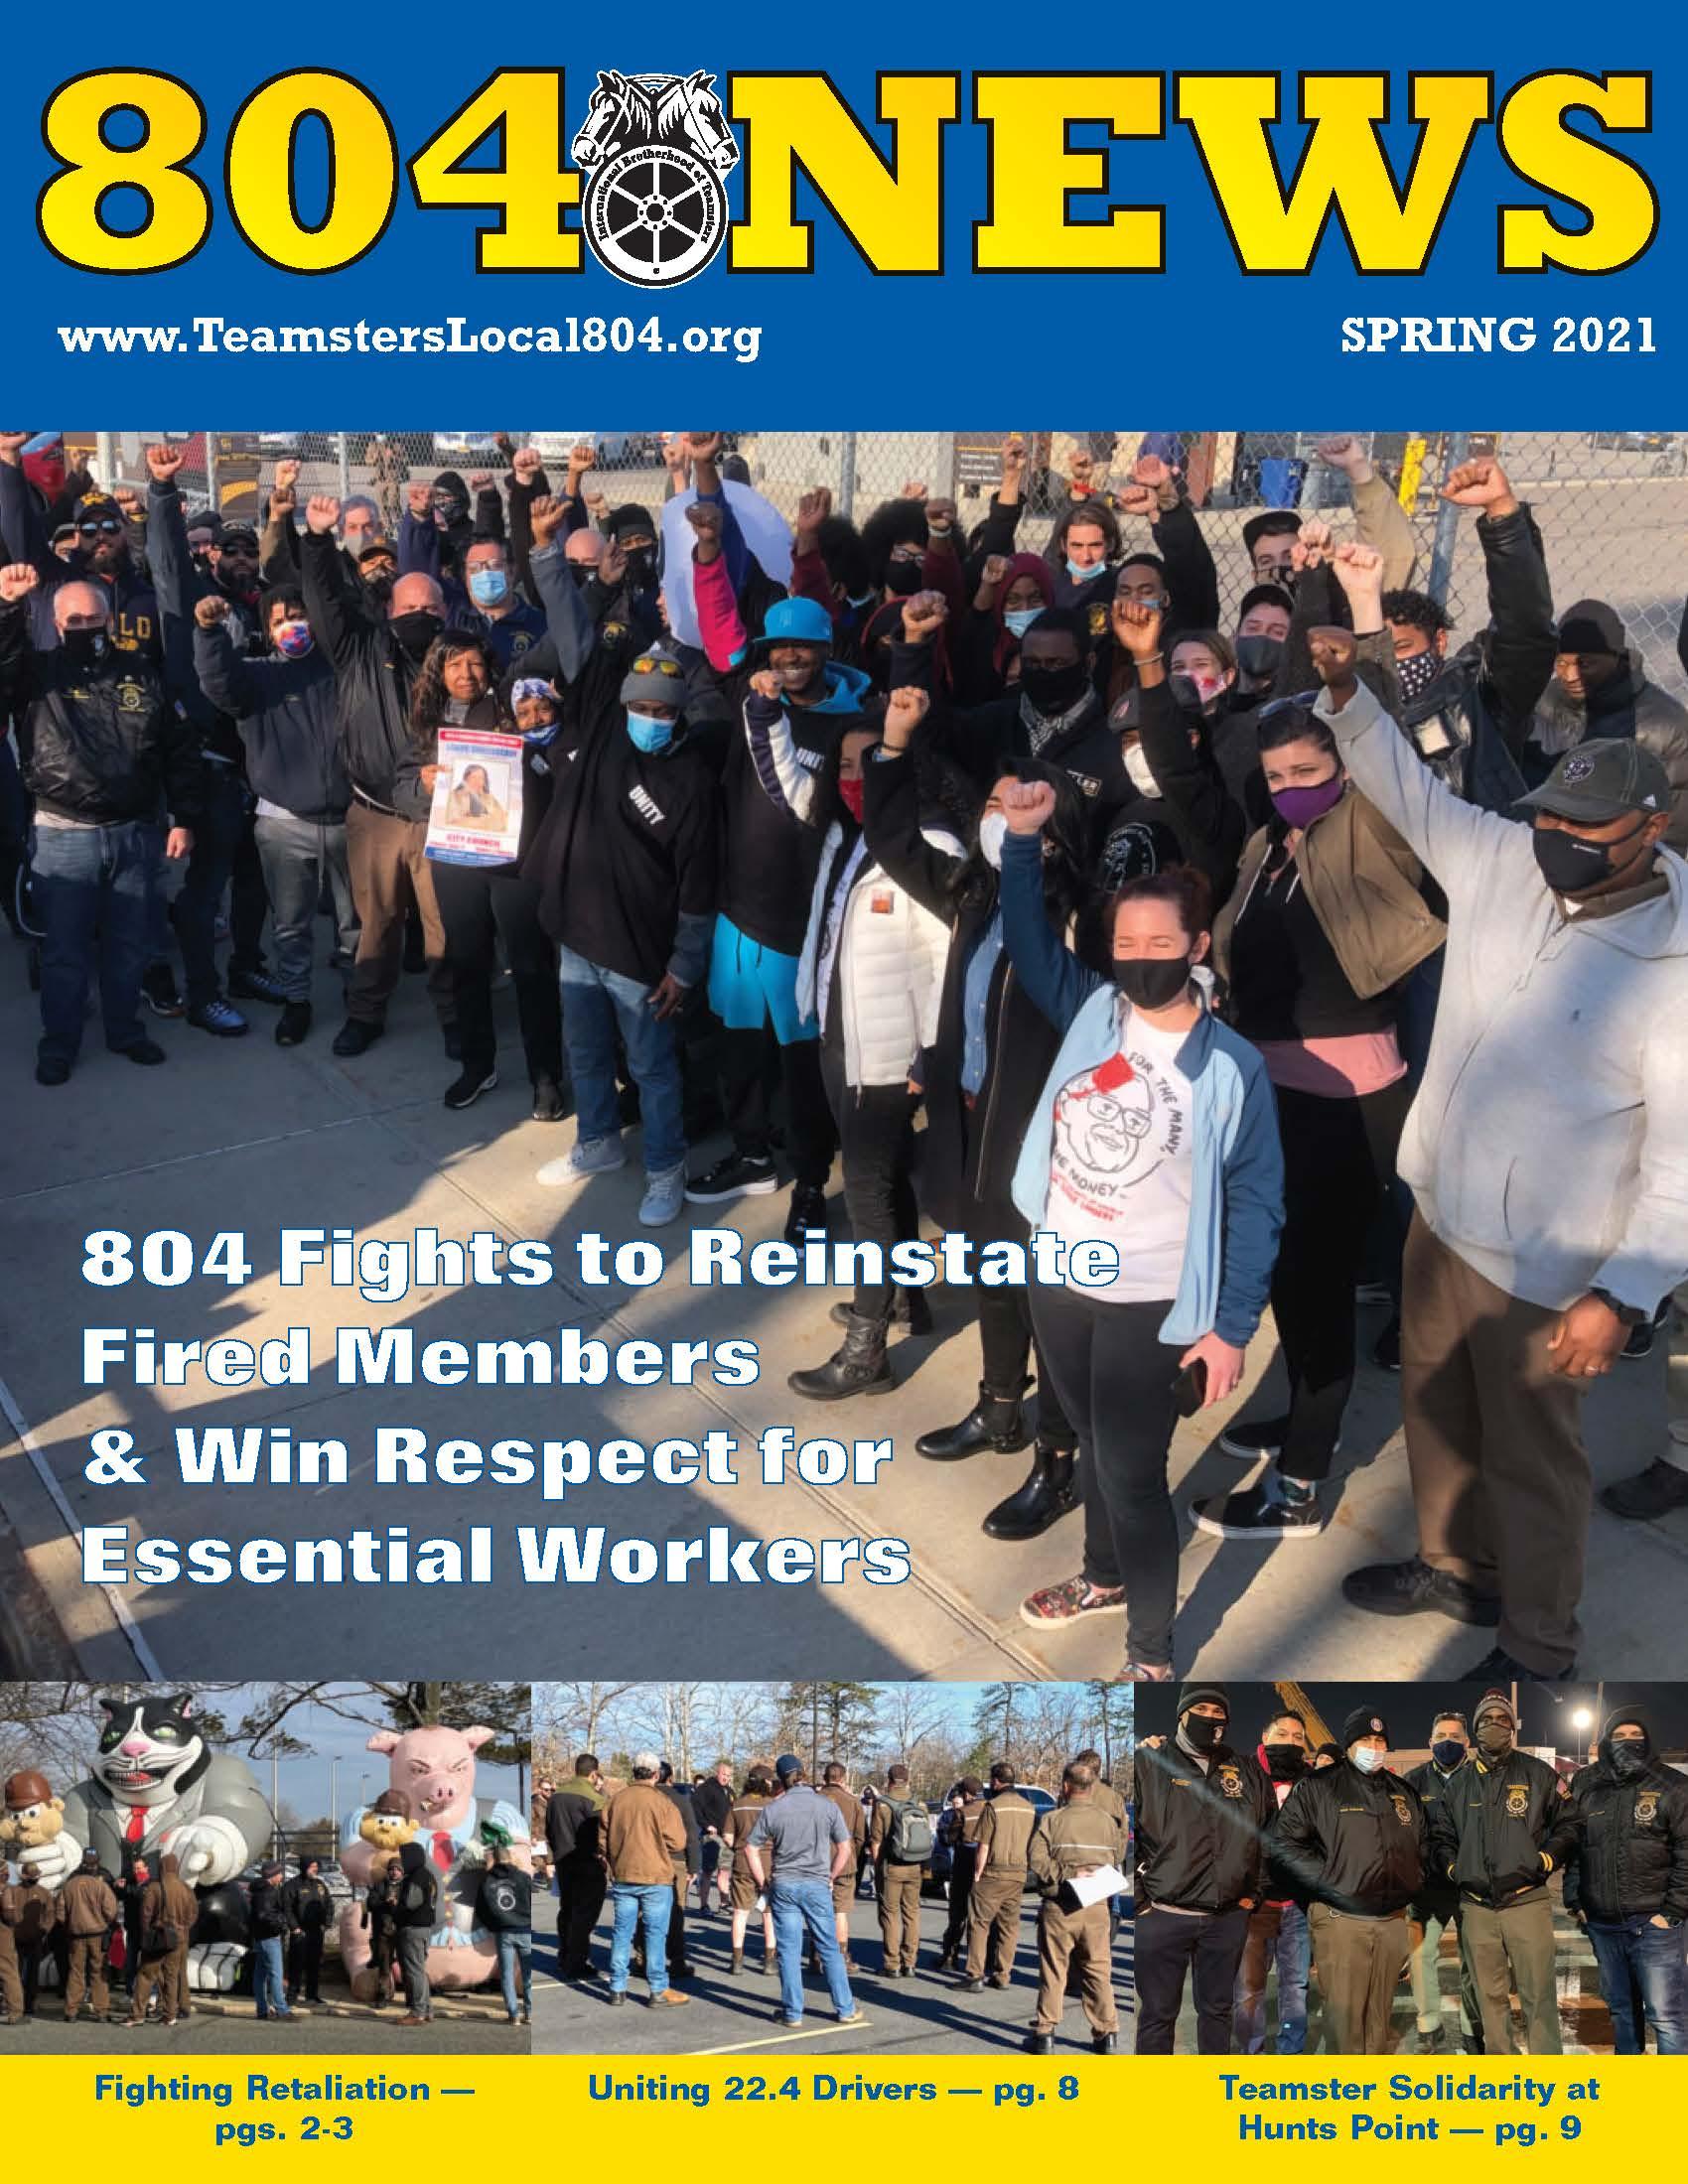 COVER-804News-Spring-2021-WEB.jpg